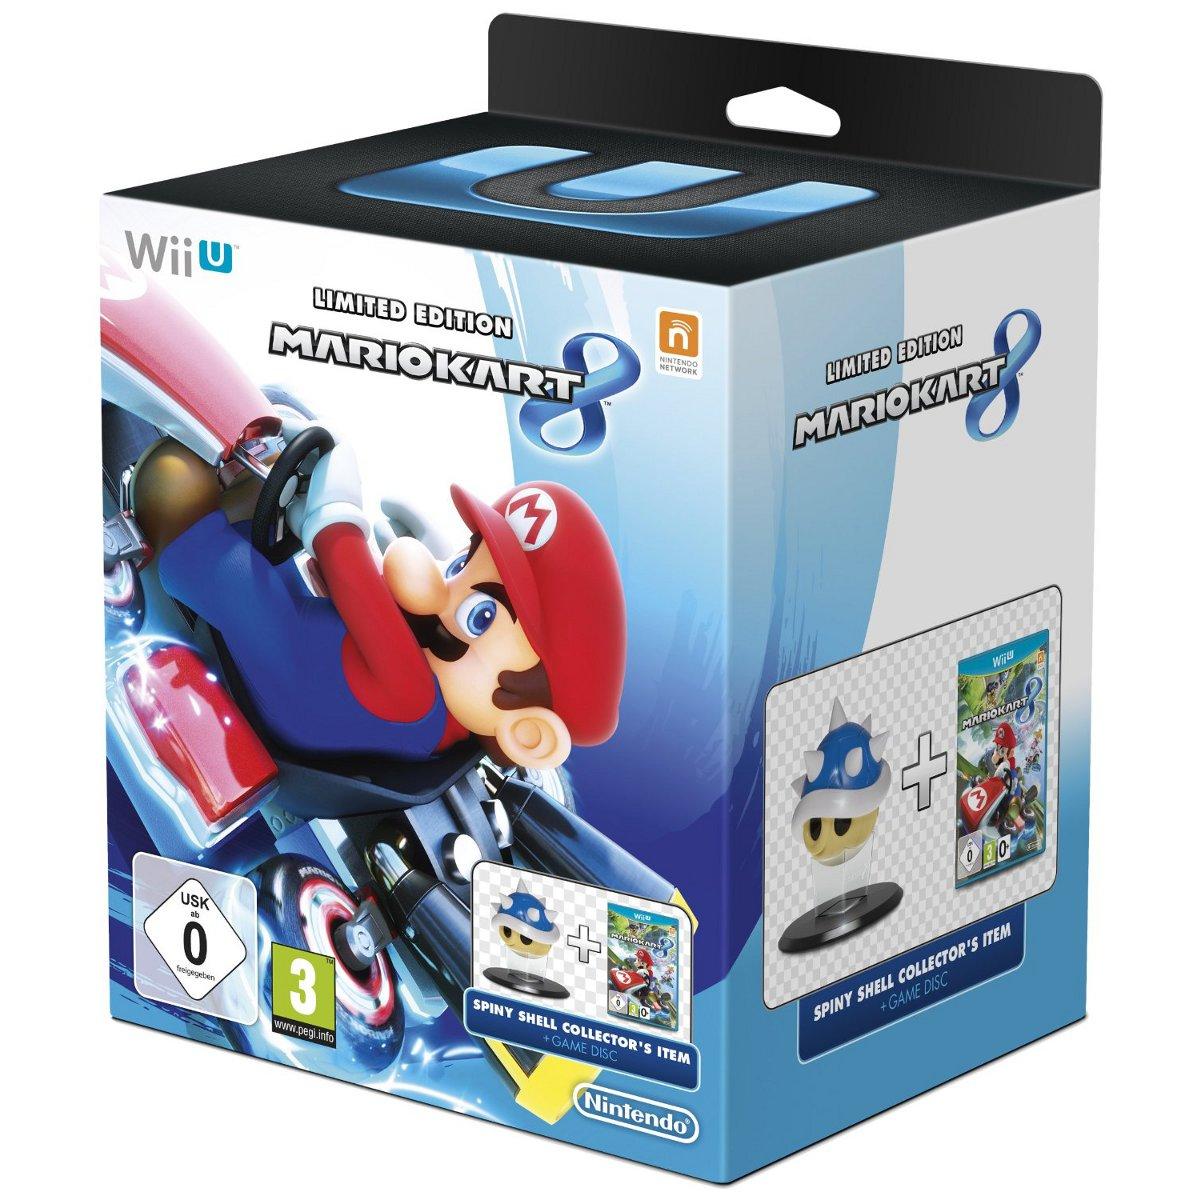 Jeux Wii U Mario Kart 8 Limited Edition (Wii U) Mario Kart 8 Limited Edition (Wii U)